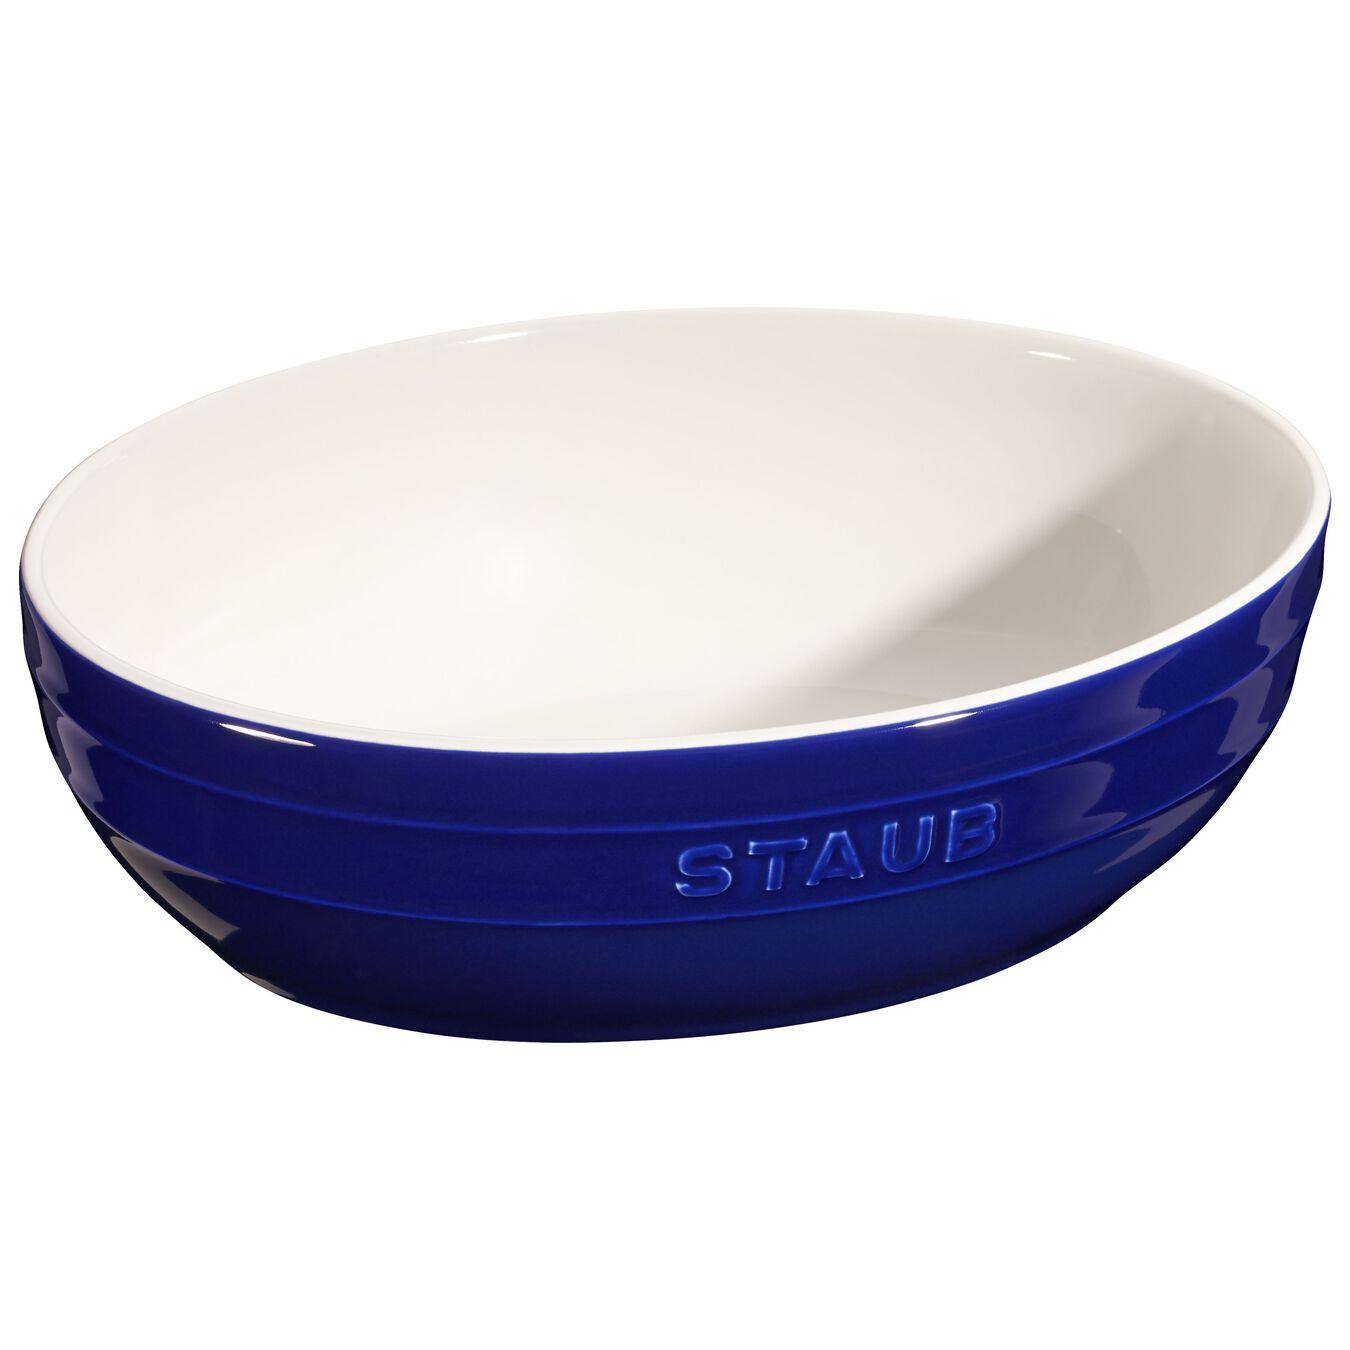 2-pcs Ceramic oval Service de bols, Dark-Blue,,large 3